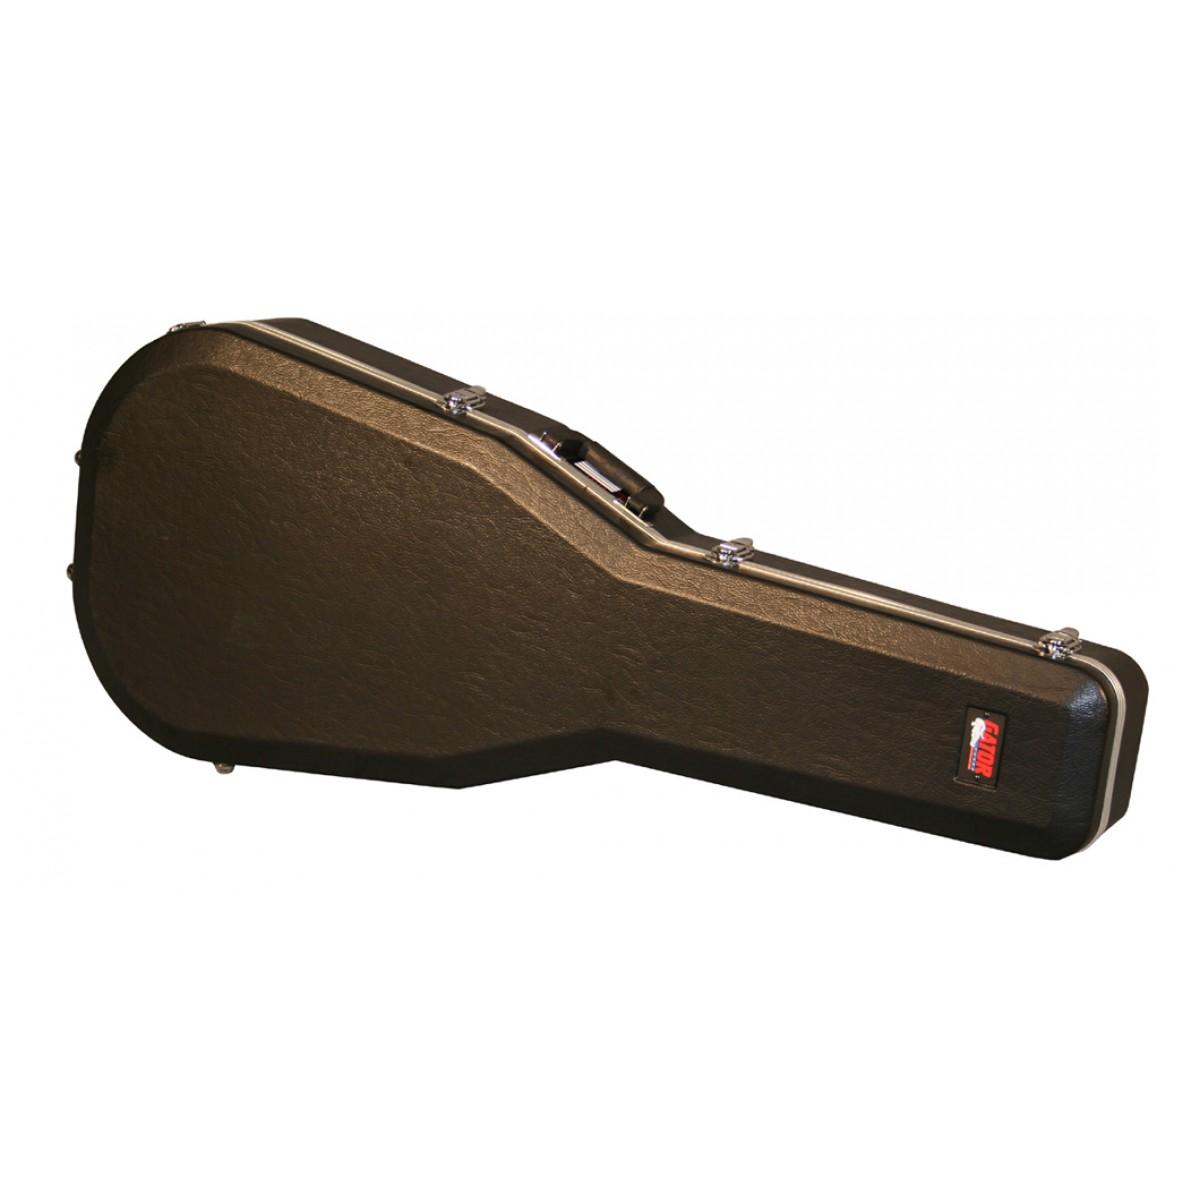 Jumbo Guitar Cases For Sale : gator gc jumbo dlx molded case jumbo acoustic guitar ~ Vivirlamusica.com Haus und Dekorationen